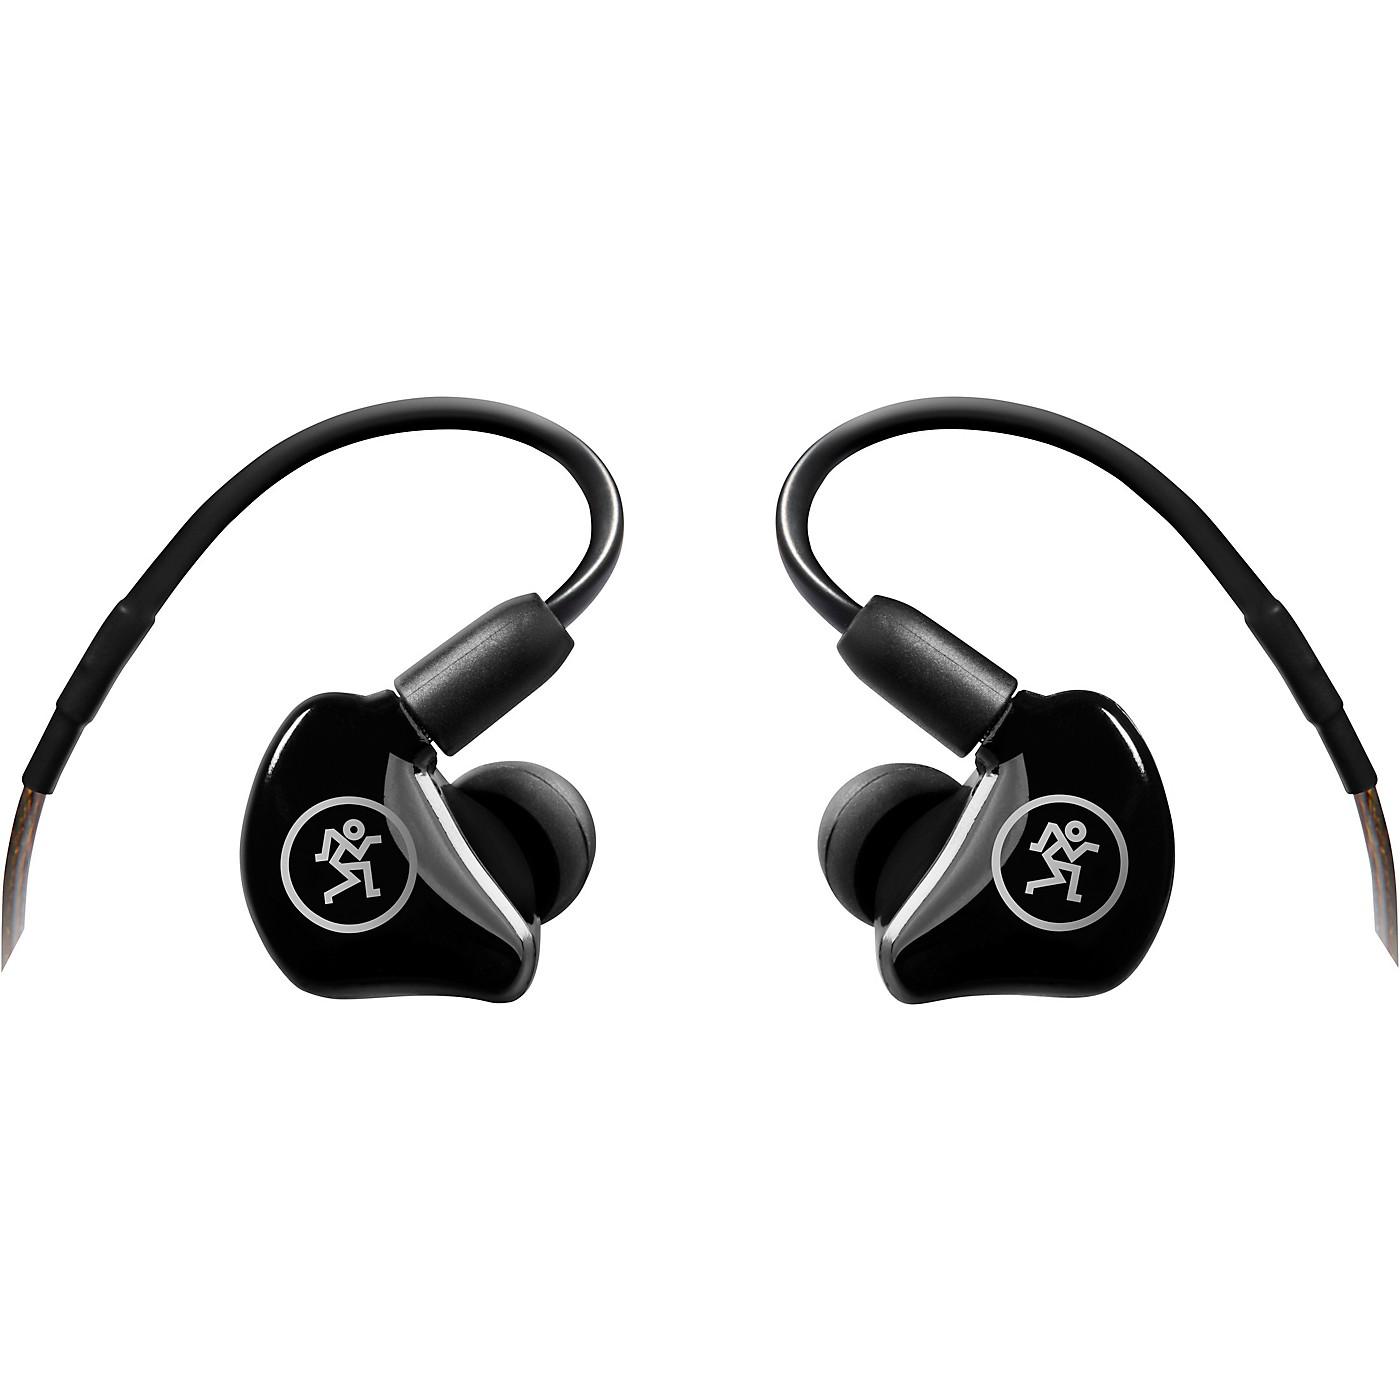 Mackie MP-120 Single Dynamic Driver Professional In-Ear Monitors thumbnail